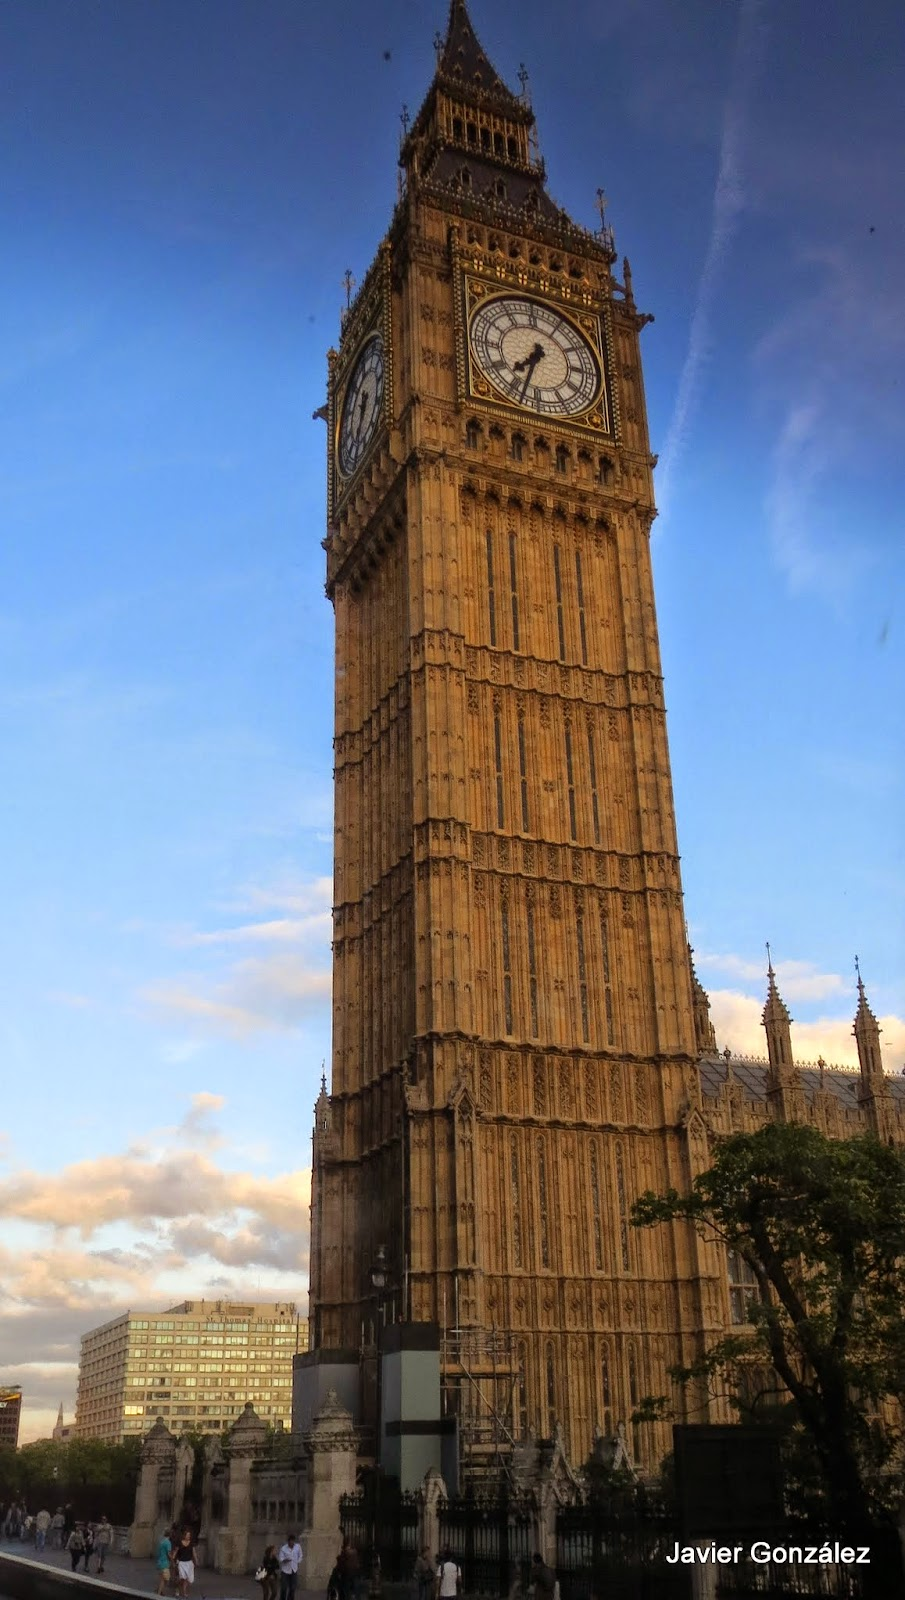 Londres. Big Ben